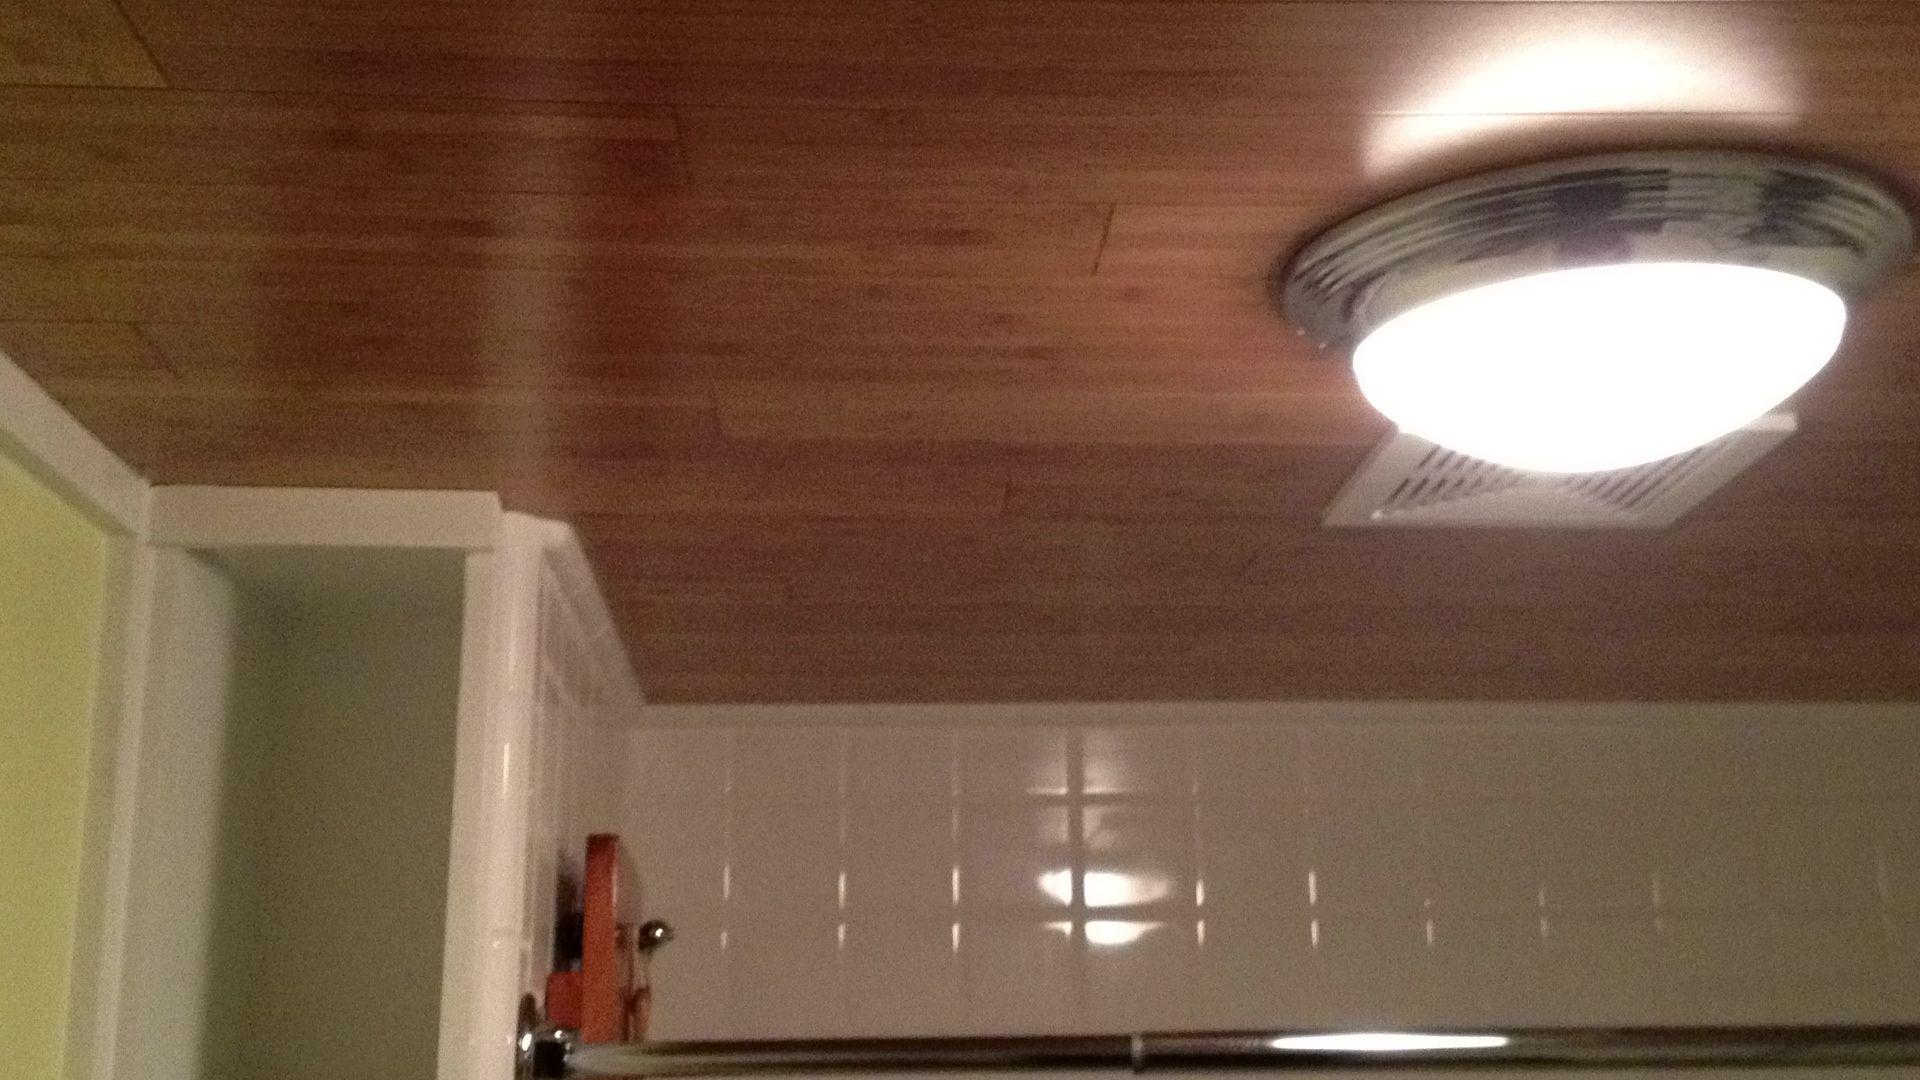 Bamboo Flooring On The Bathroom Ceiling Nice Work